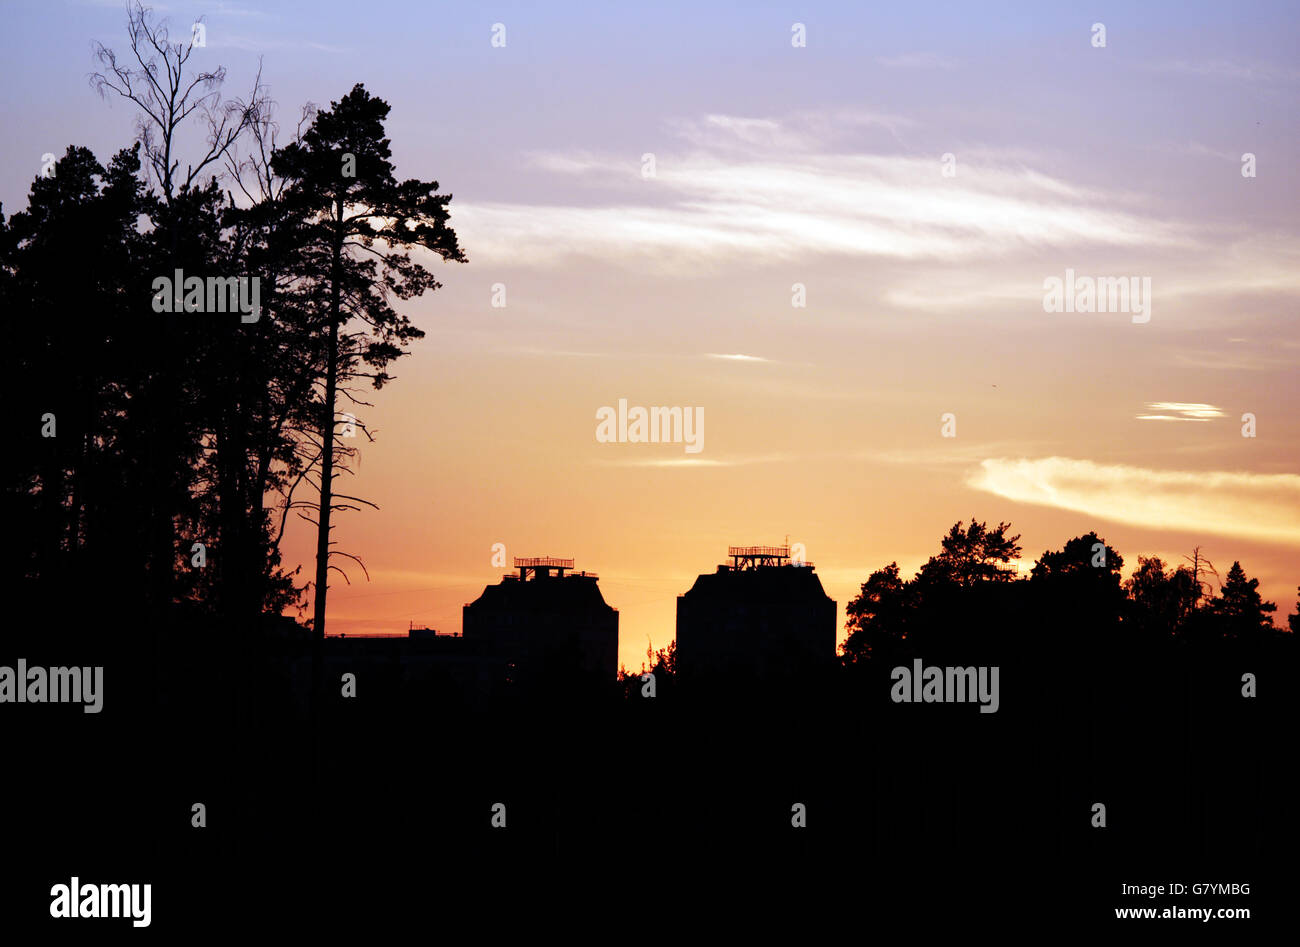 Naranja atardecer y dos casas con contornos de árboles Imagen De Stock